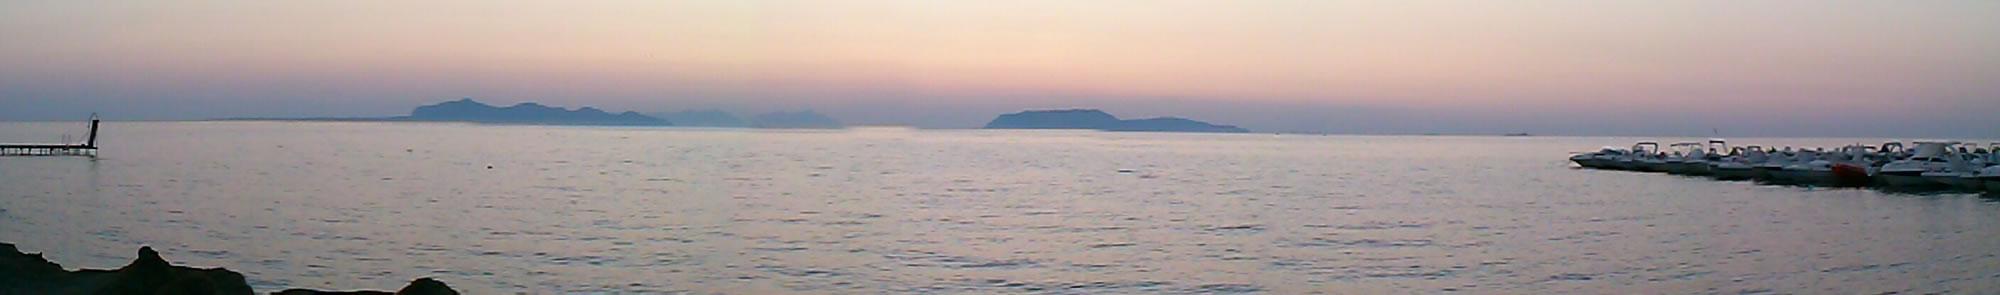 Sunset on Egadi Islands